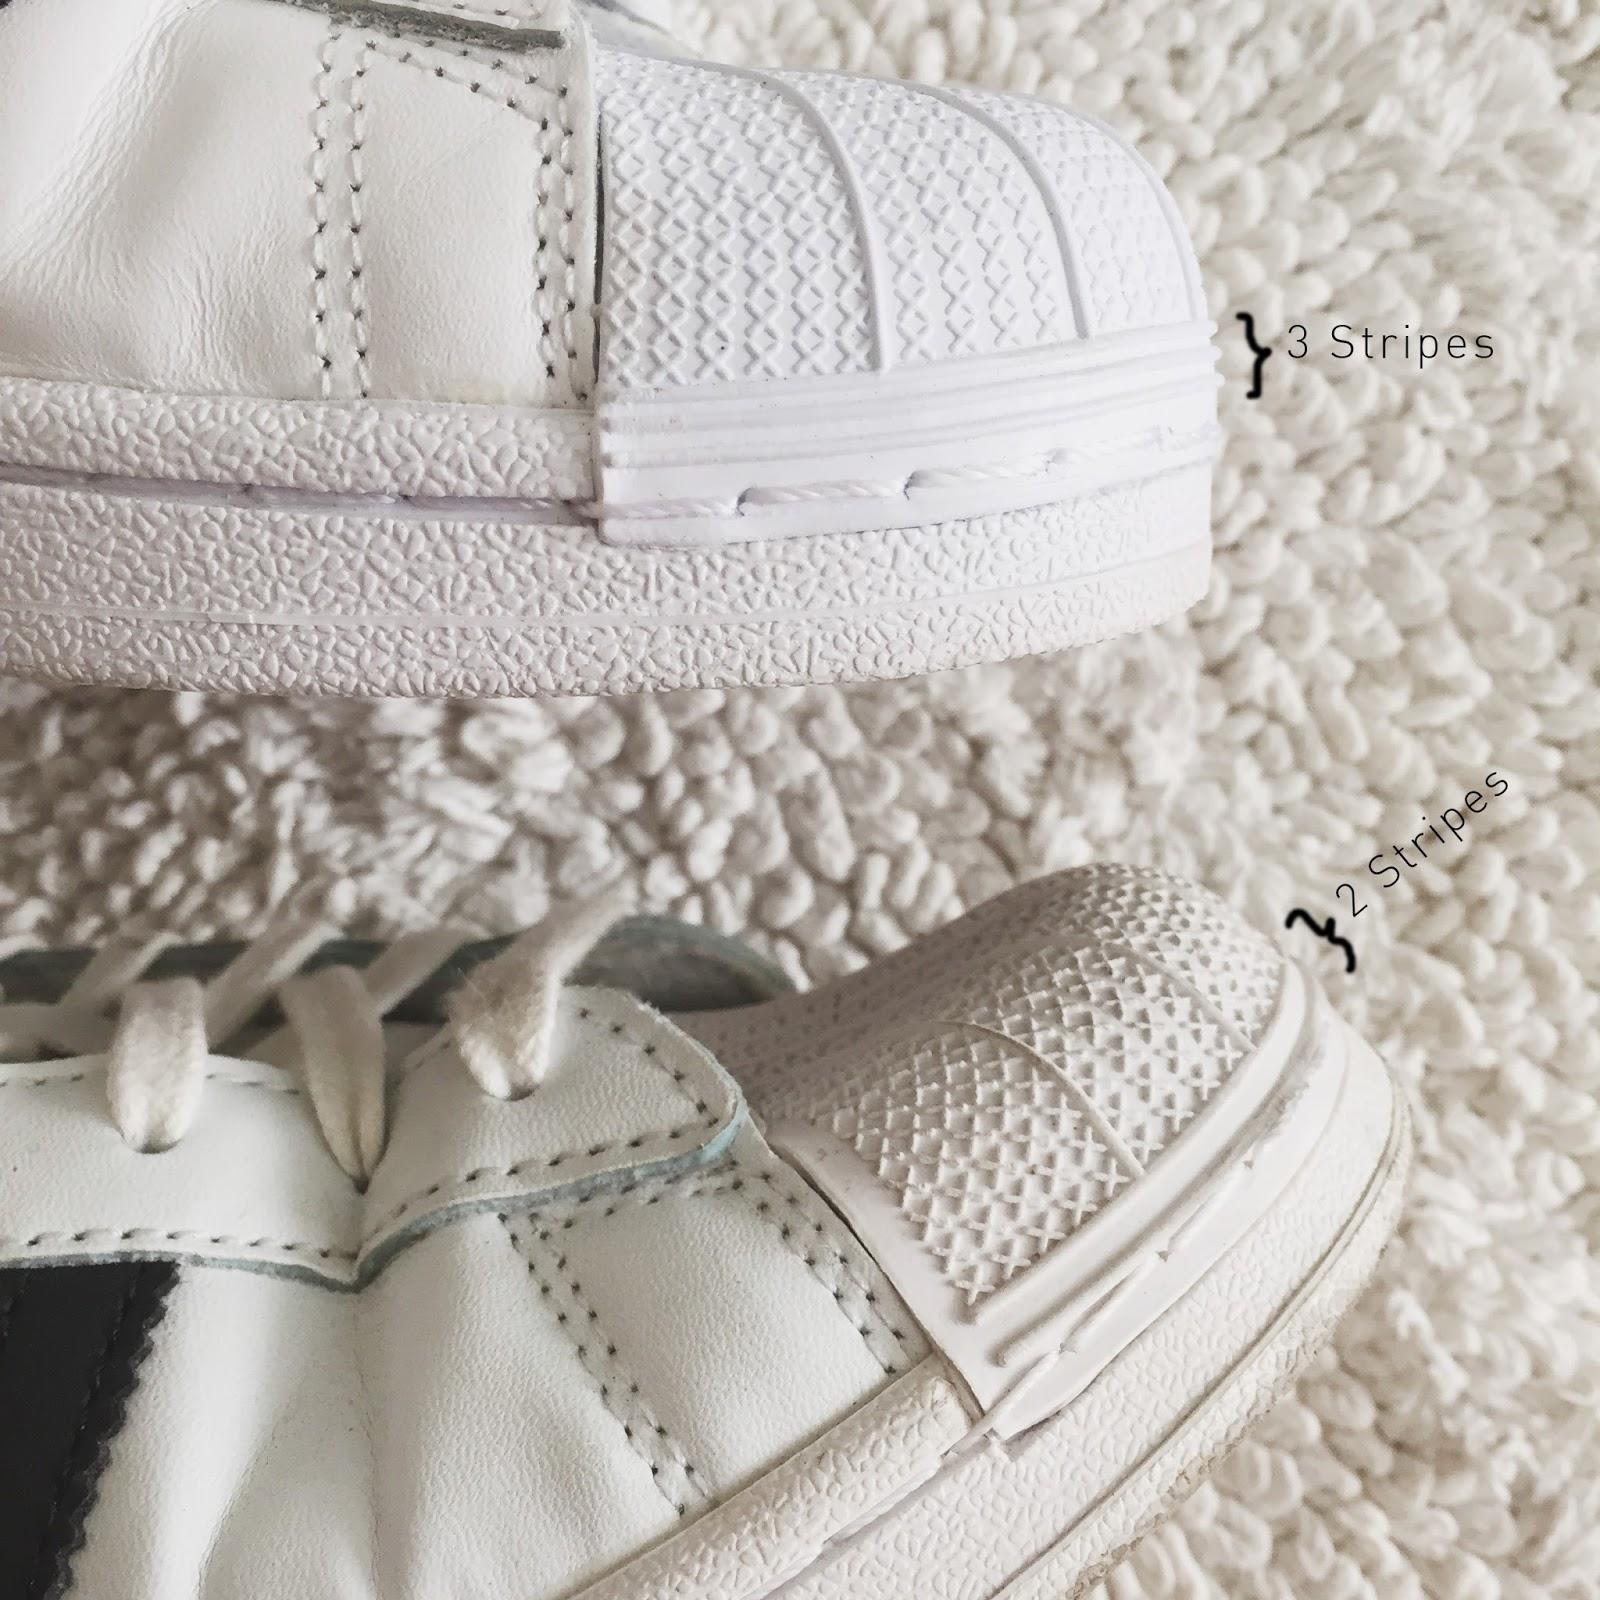 Adidas Superstar White Original Vs Fake Herbusinessuk Co Uk